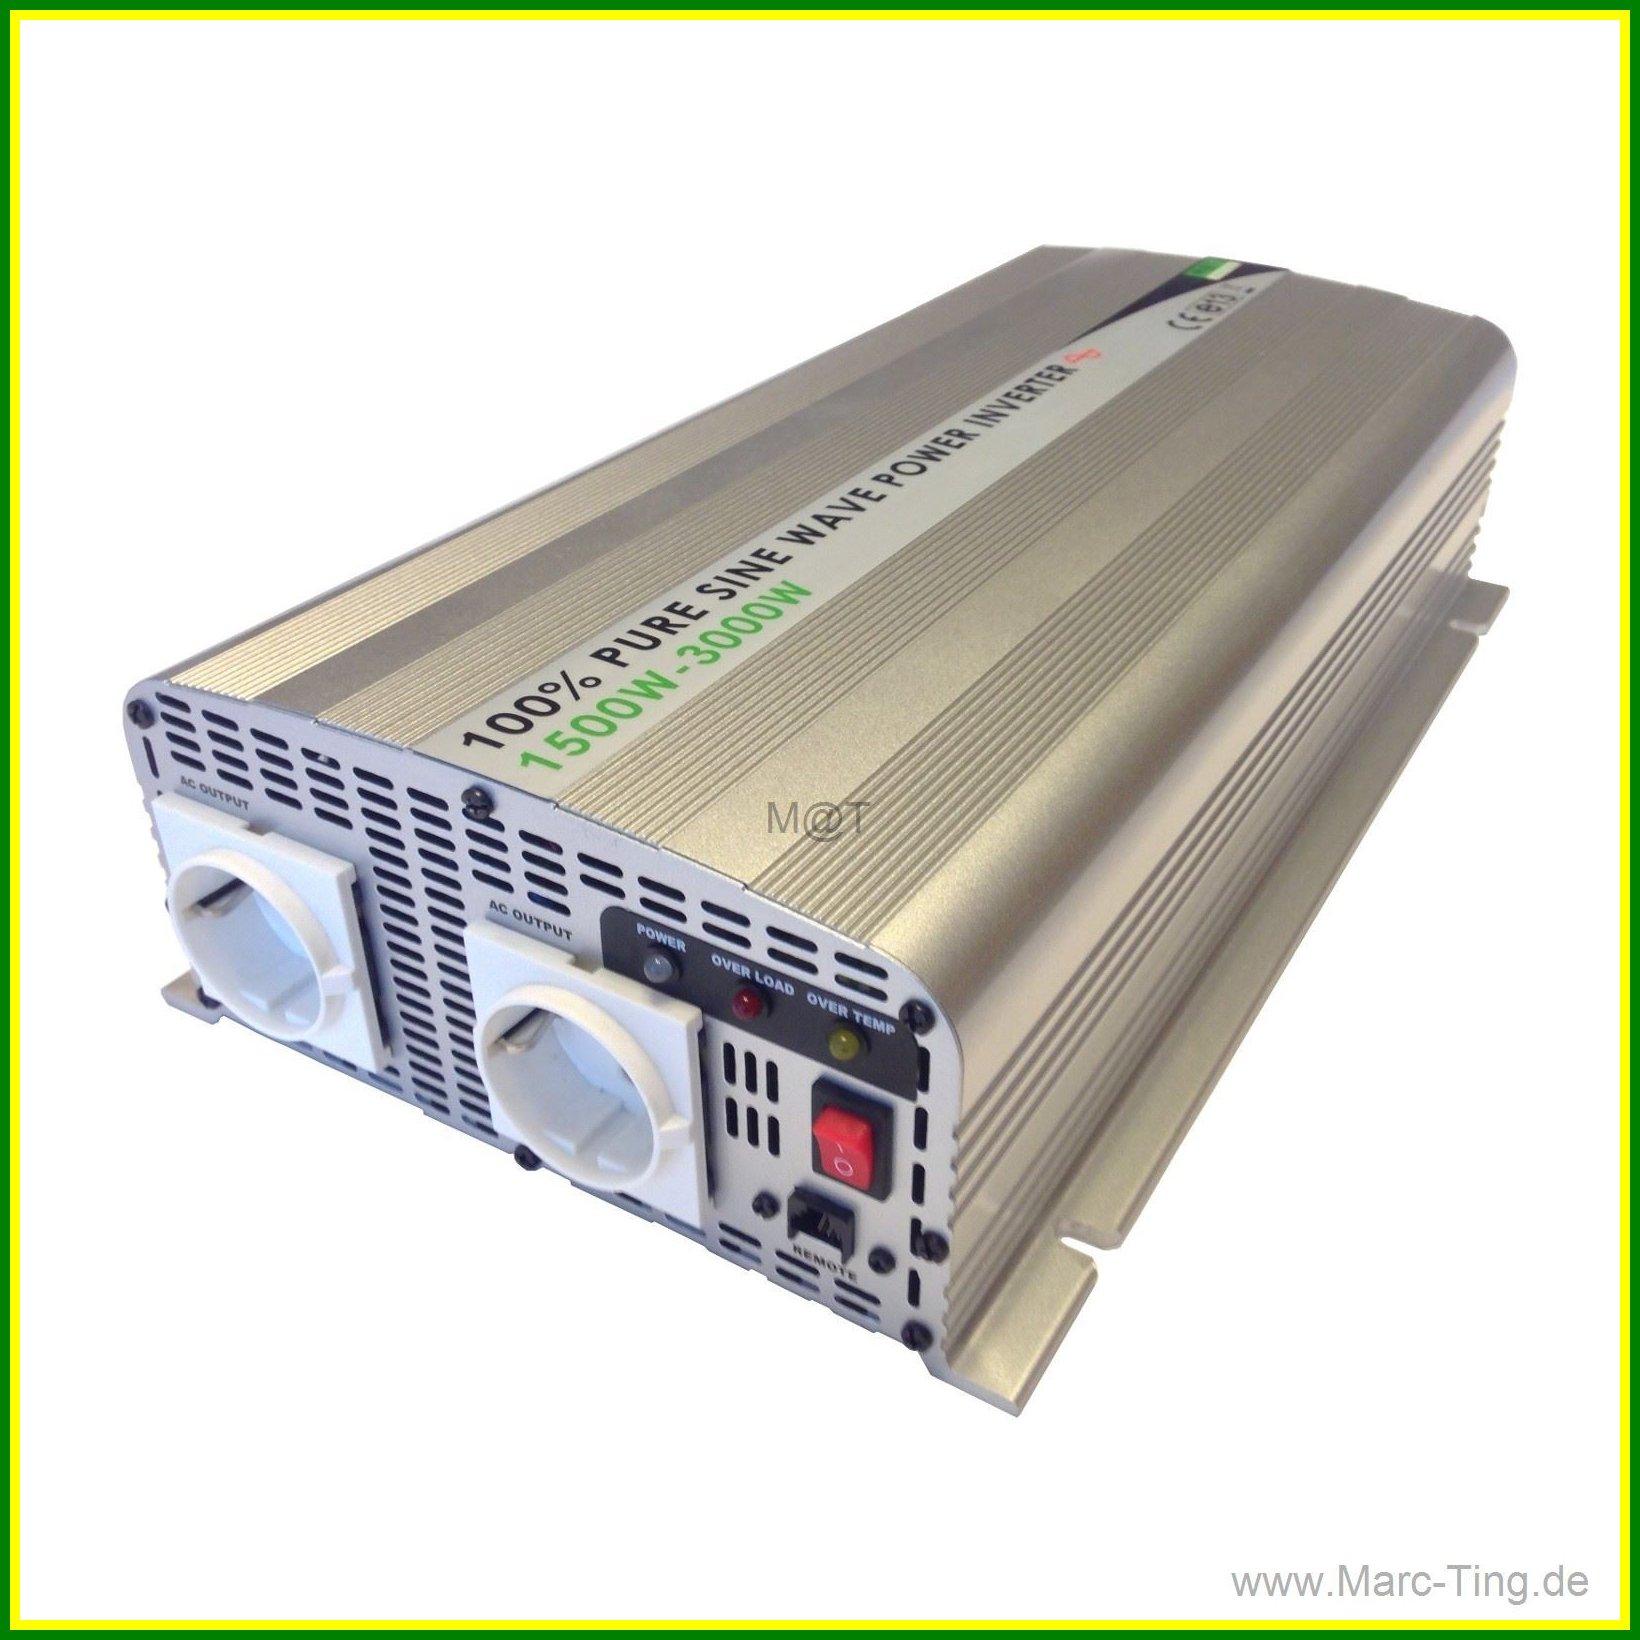 Marc@Ting Green Energy - 1500W 12V REINER SINUS WECHSELRICHTER